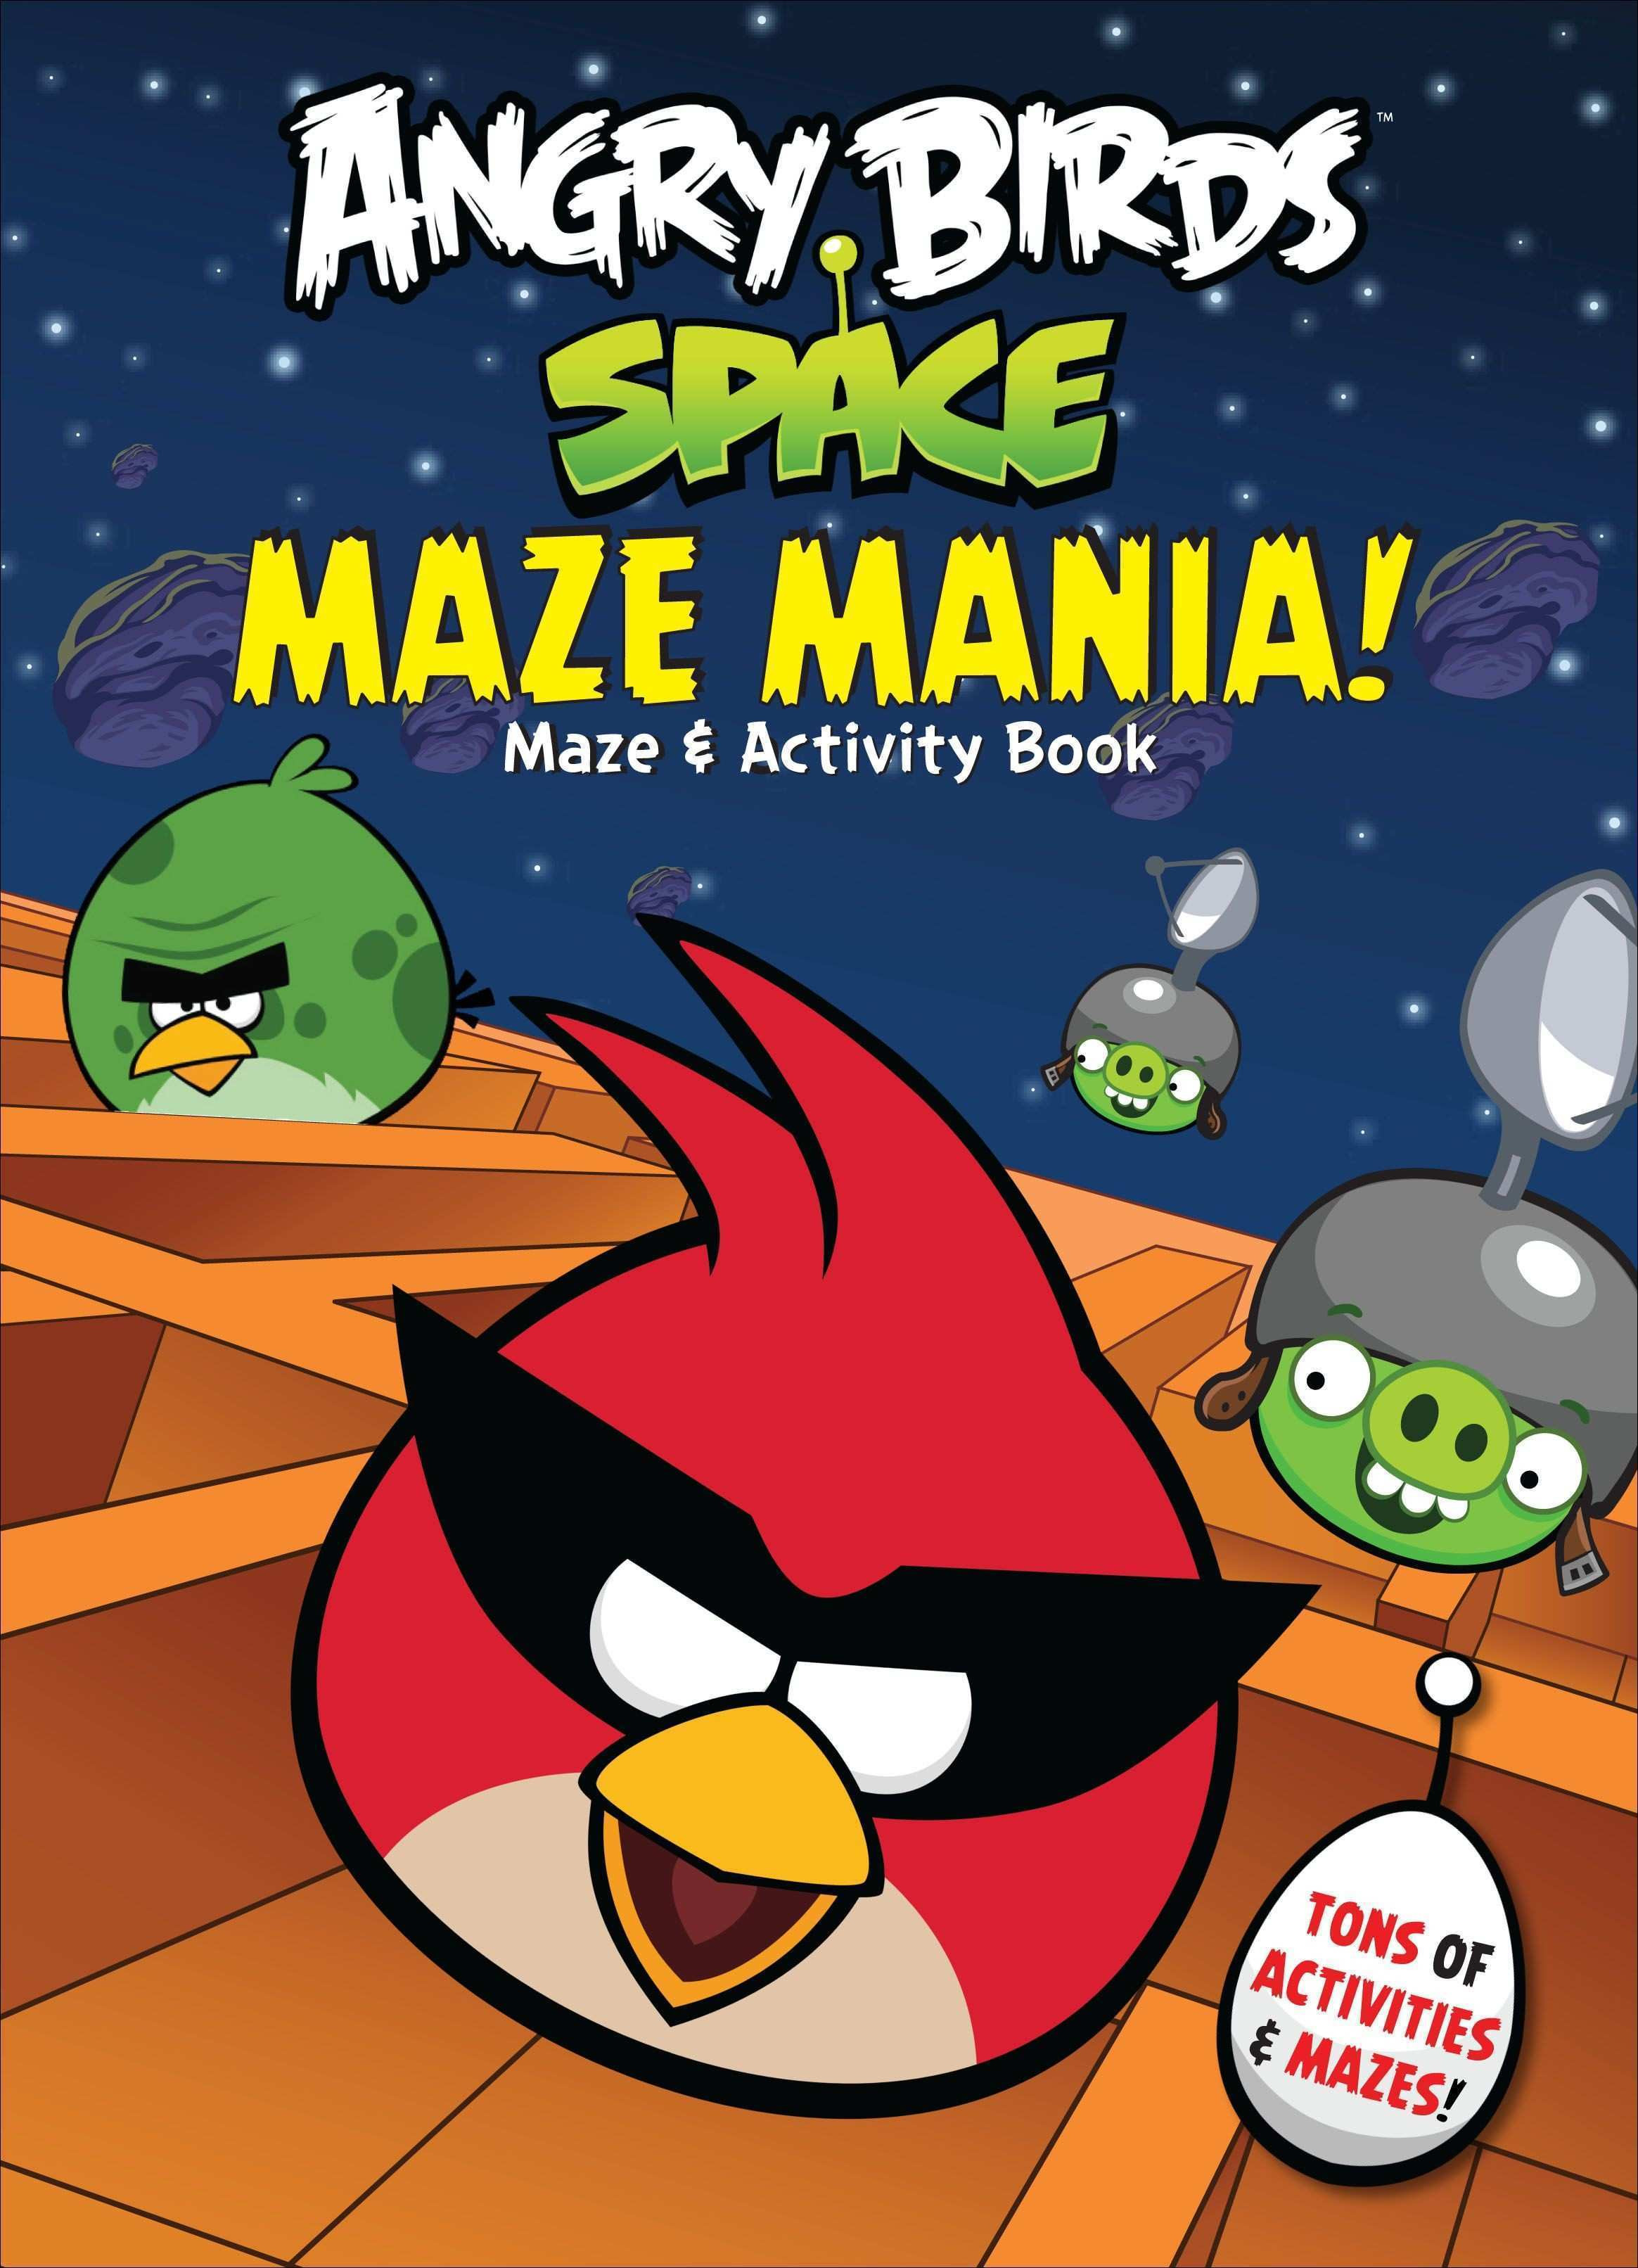 Ausmalbilder Angry Birds Inspirierend Angry Birds Star Wars Ausmalbilder Vorstellung Inspirierend Bild